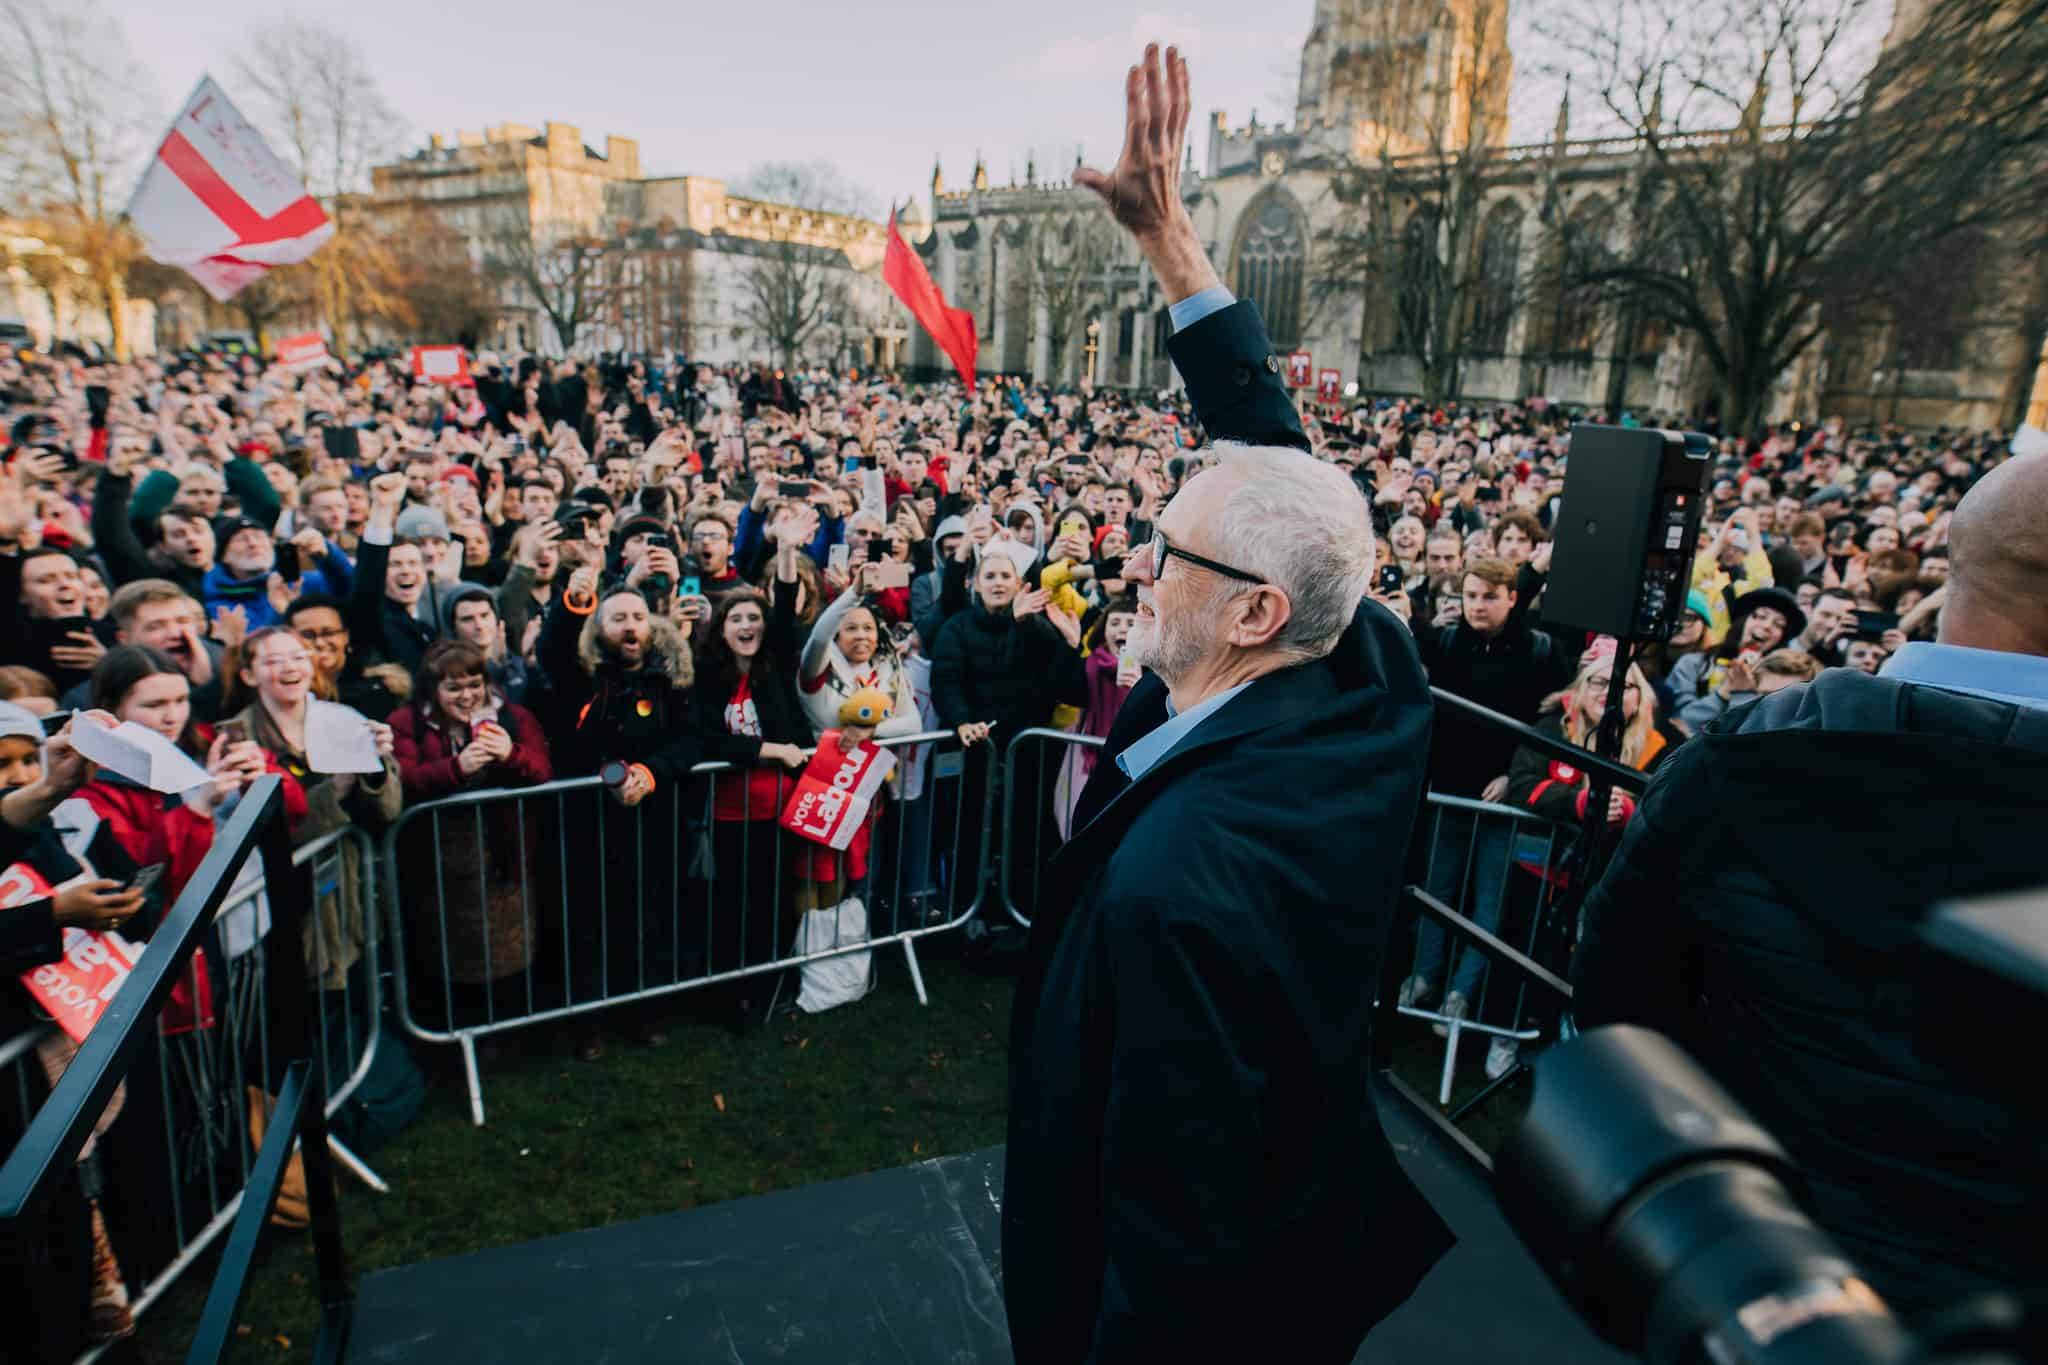 Corbyn pokes fun at Johnson for 'hiding in fridge' to avoid interview